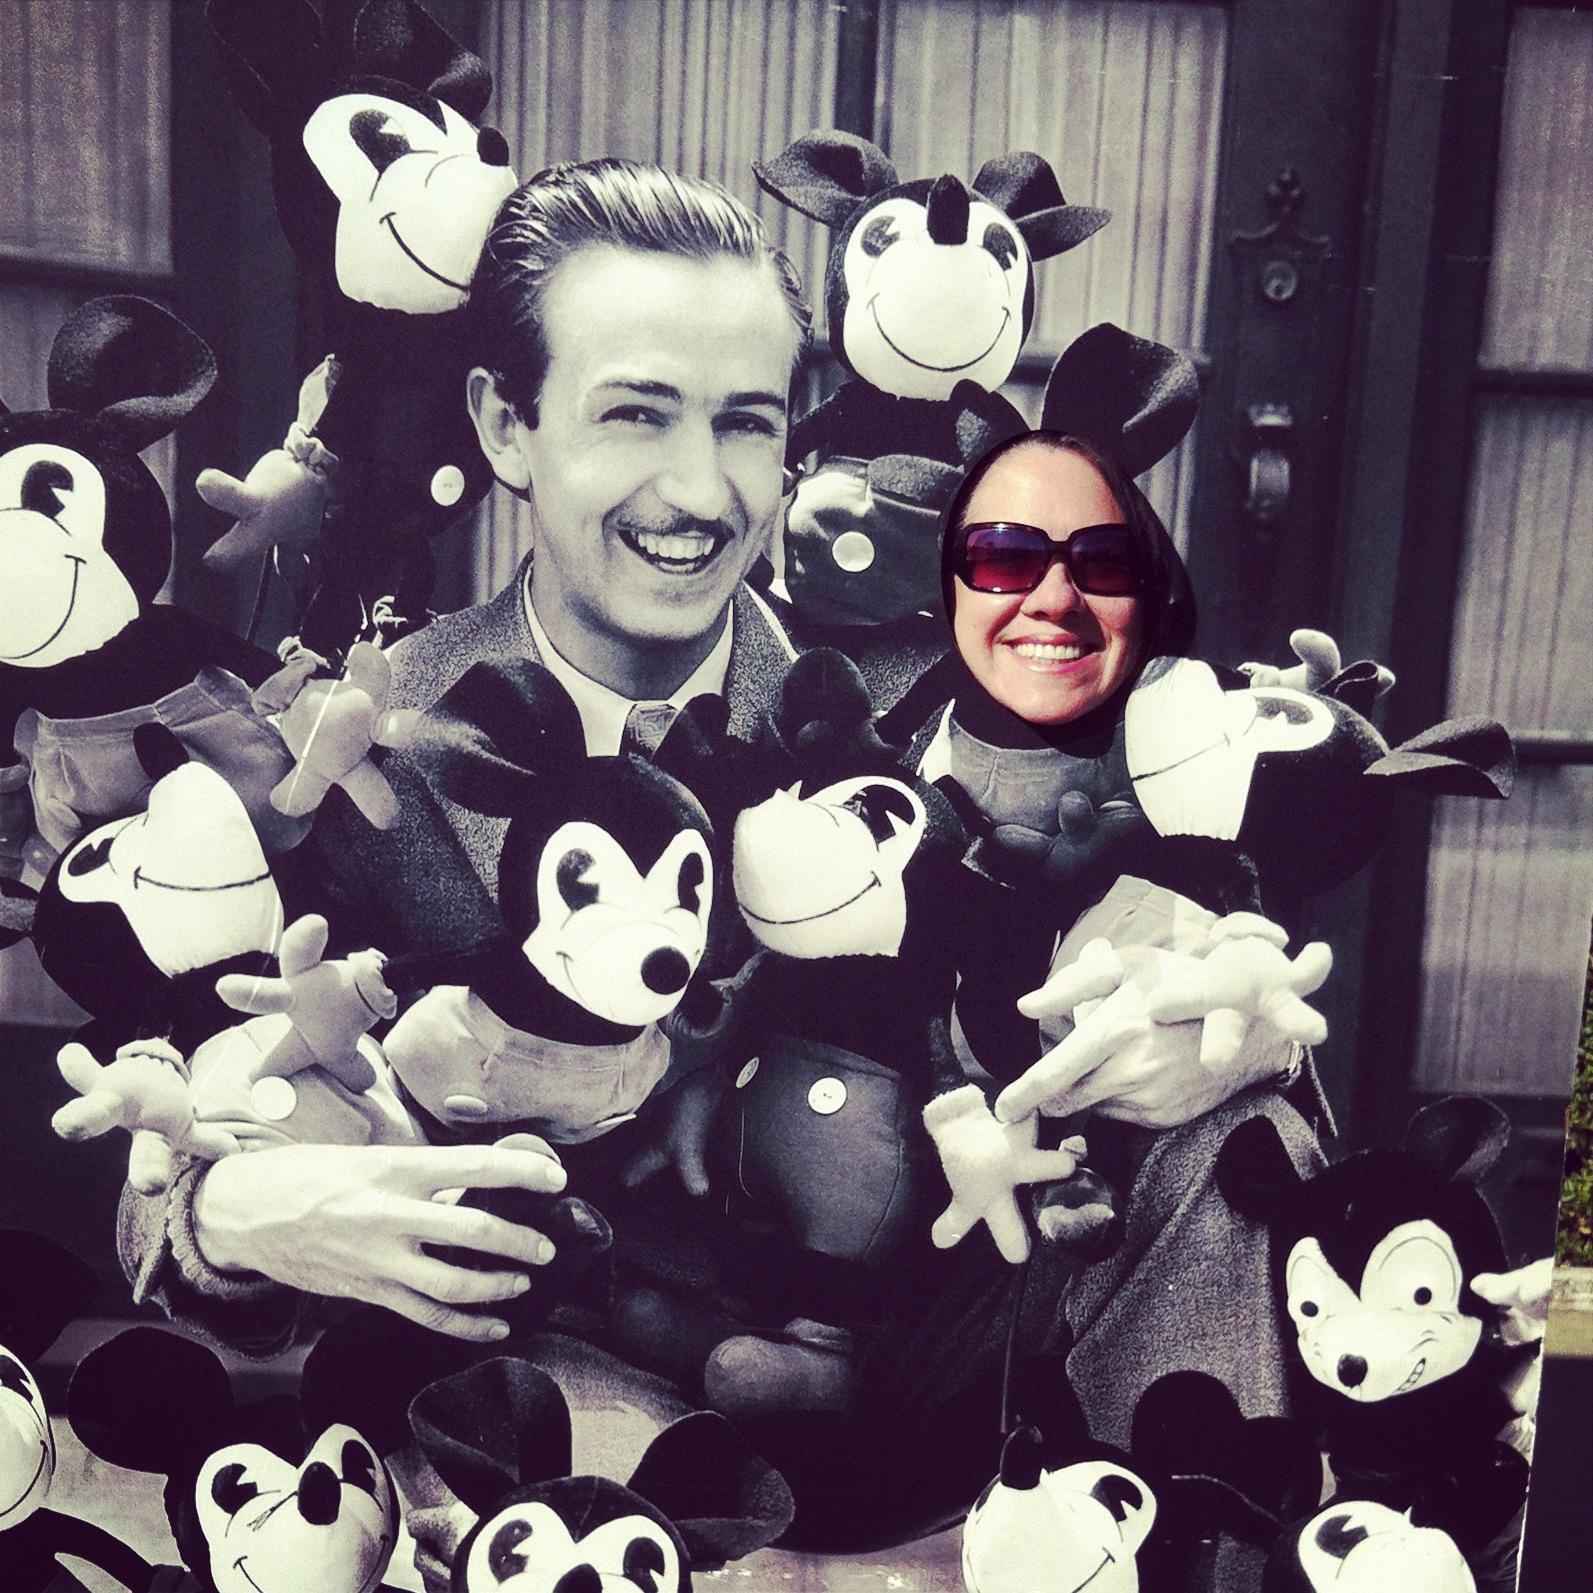 Me + Walt at The Walt Disney Museum in San Francisco (way more my speed!)